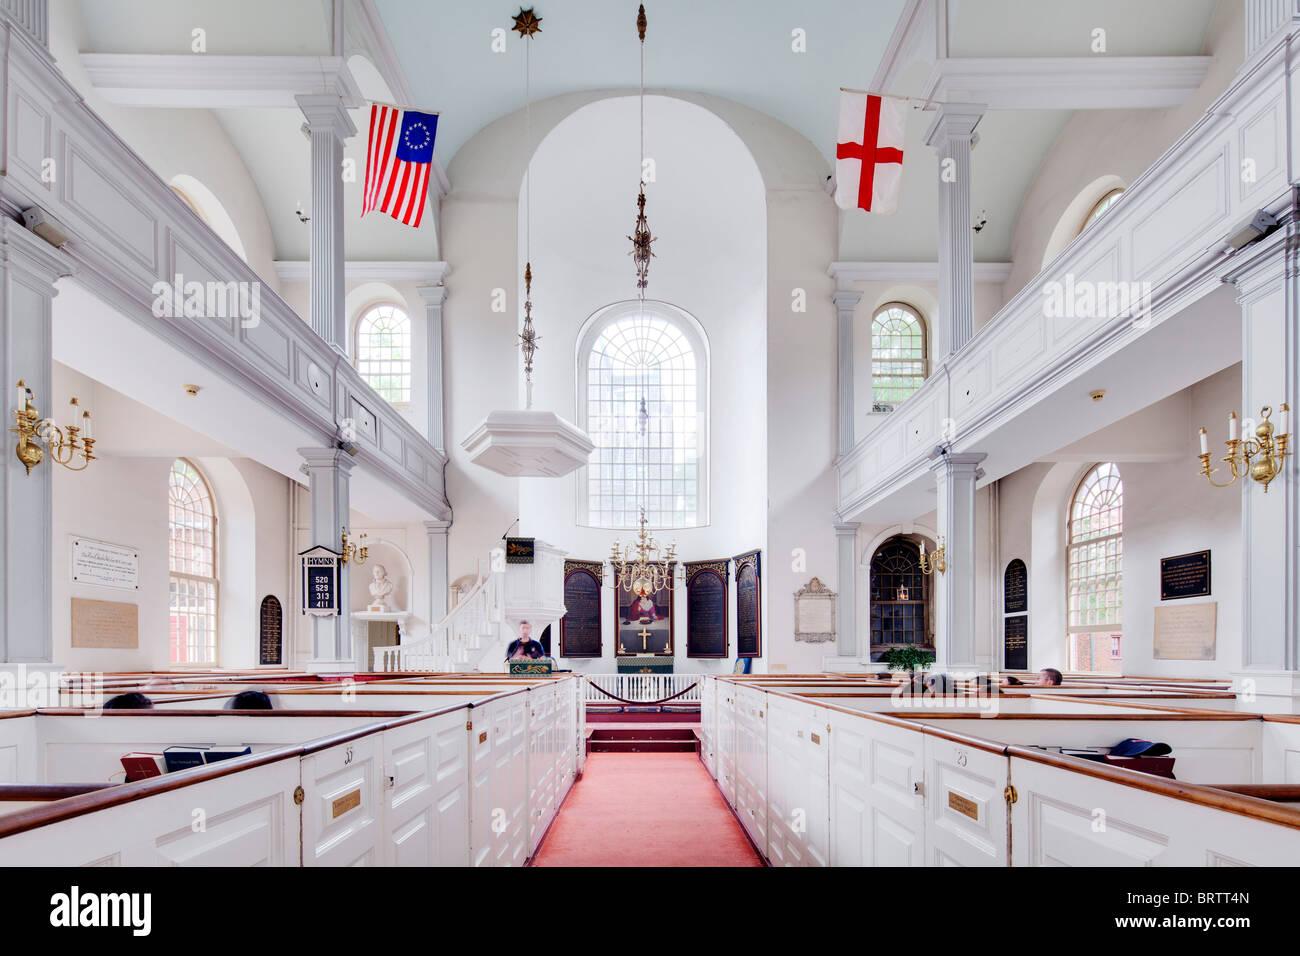 Old North Church, Boston, MA - Stock Image